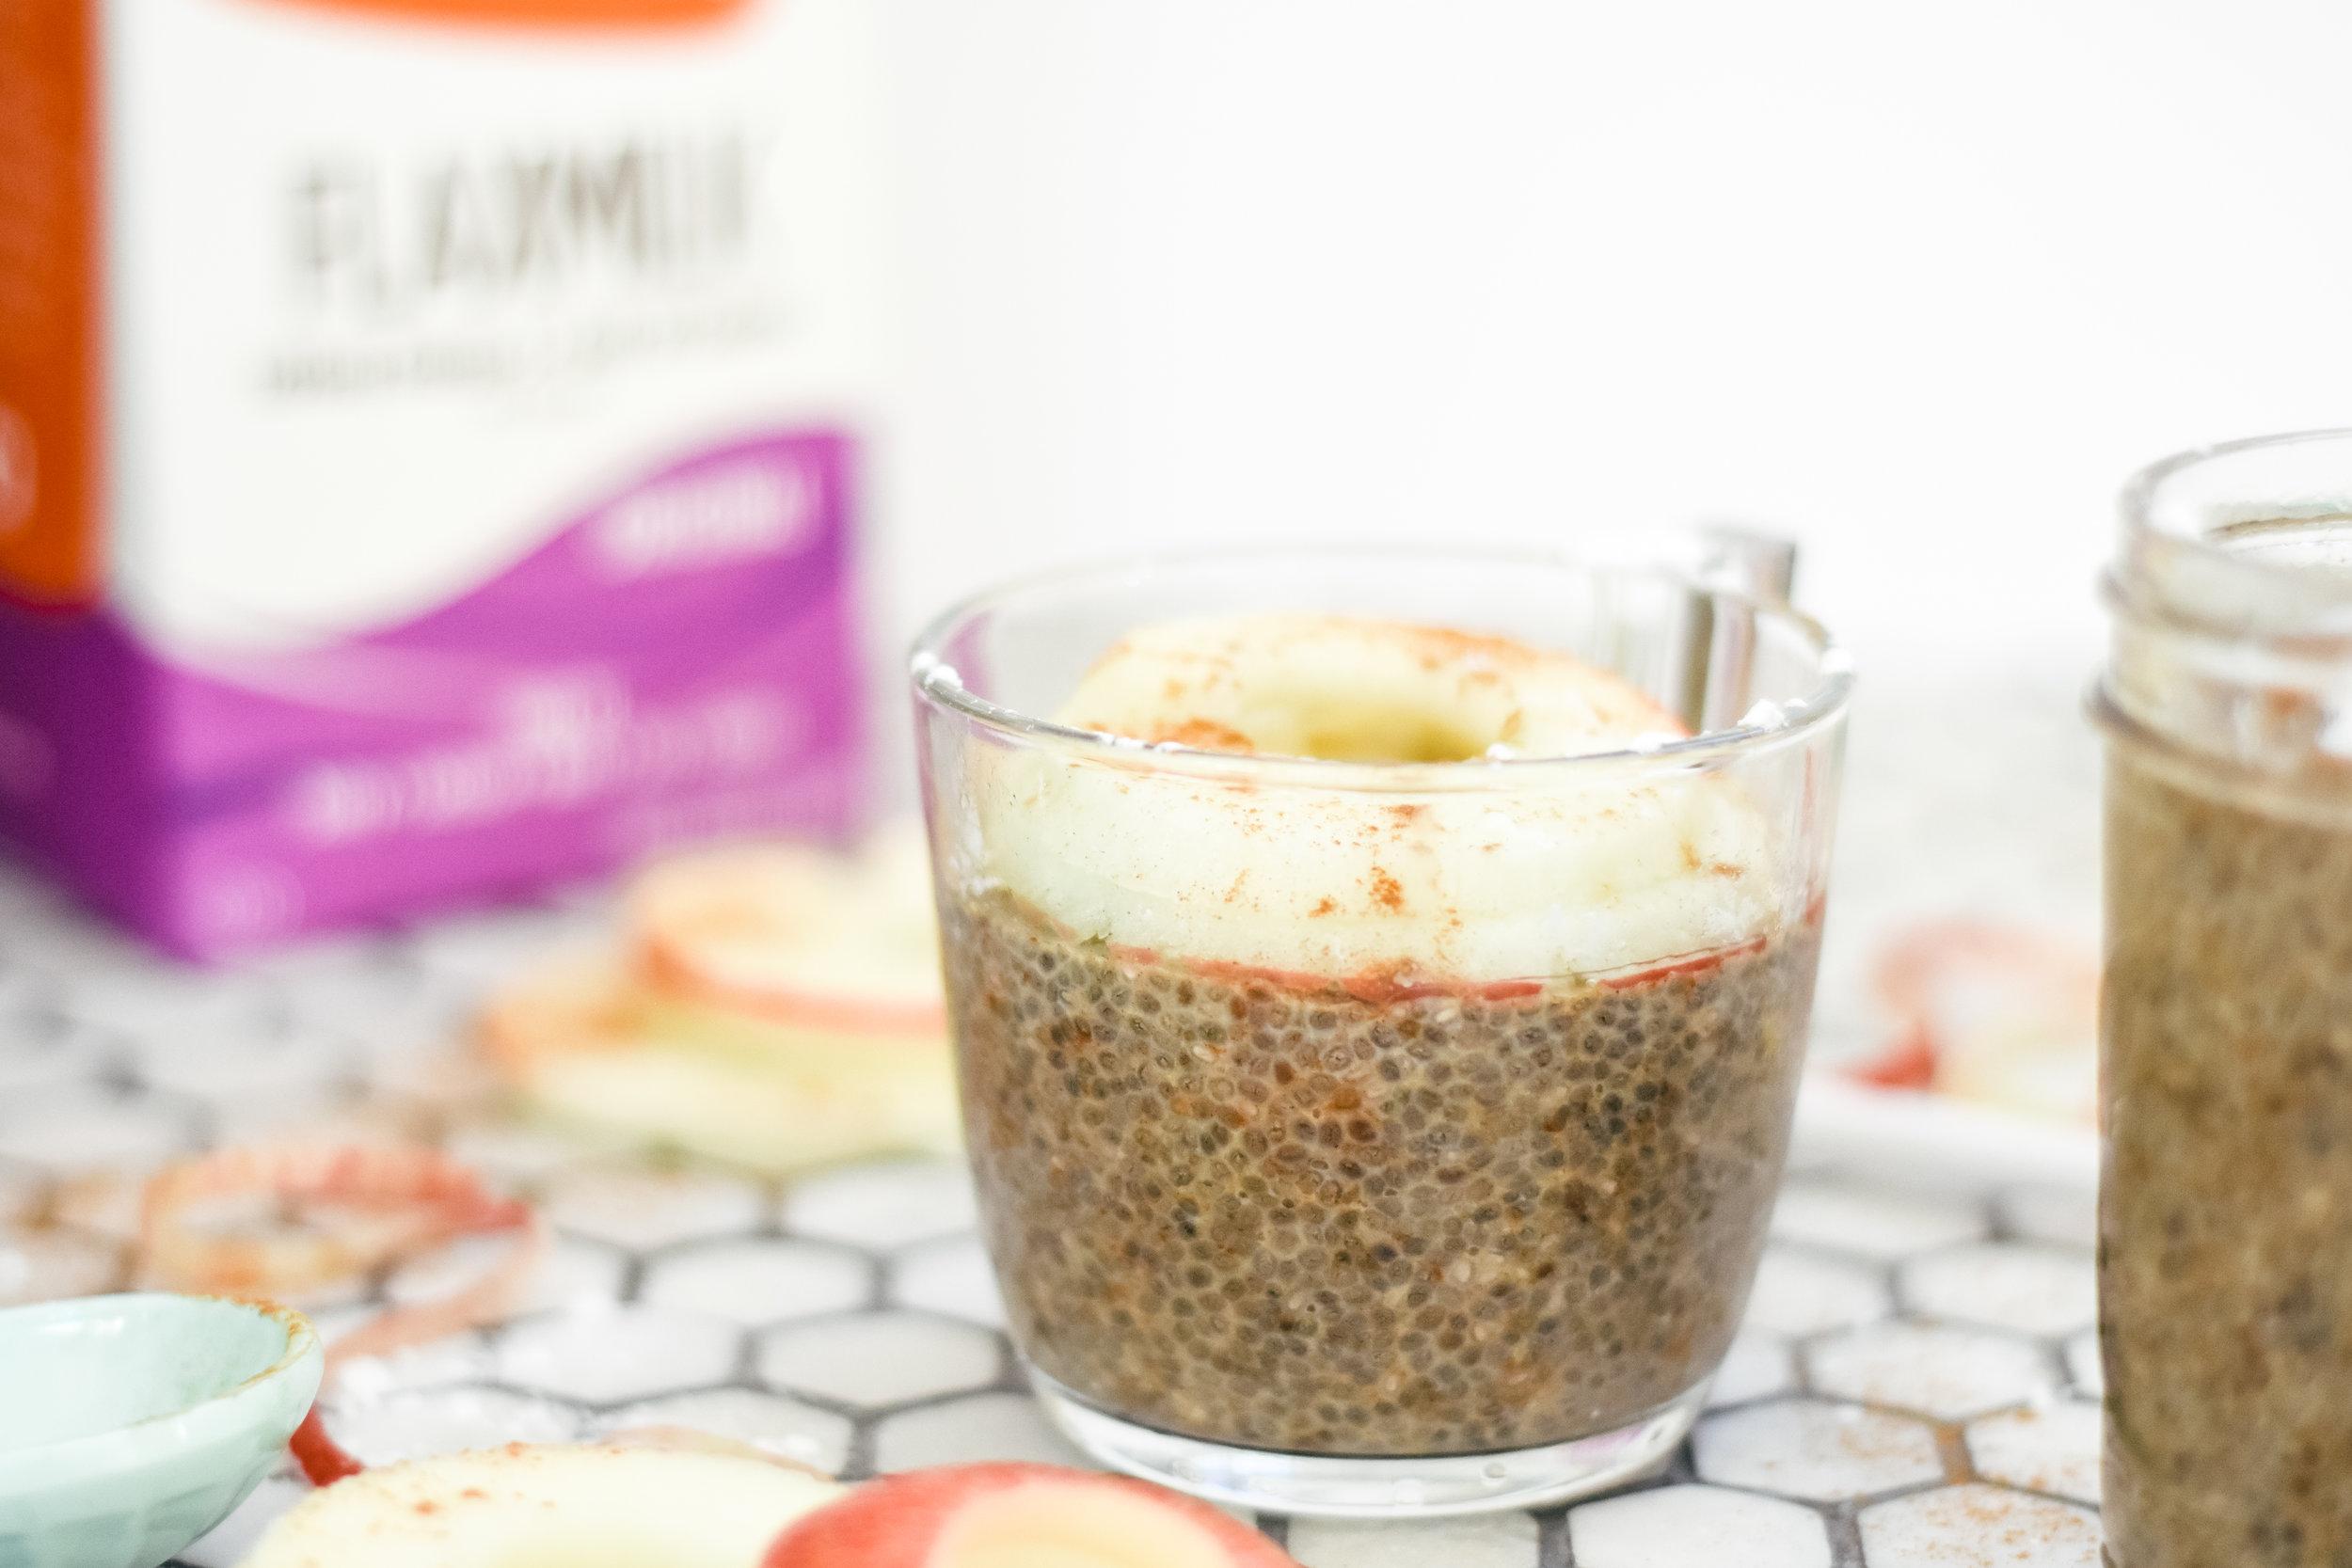 vegan chia seed pudding recipe with Good Karma Flaxmilk